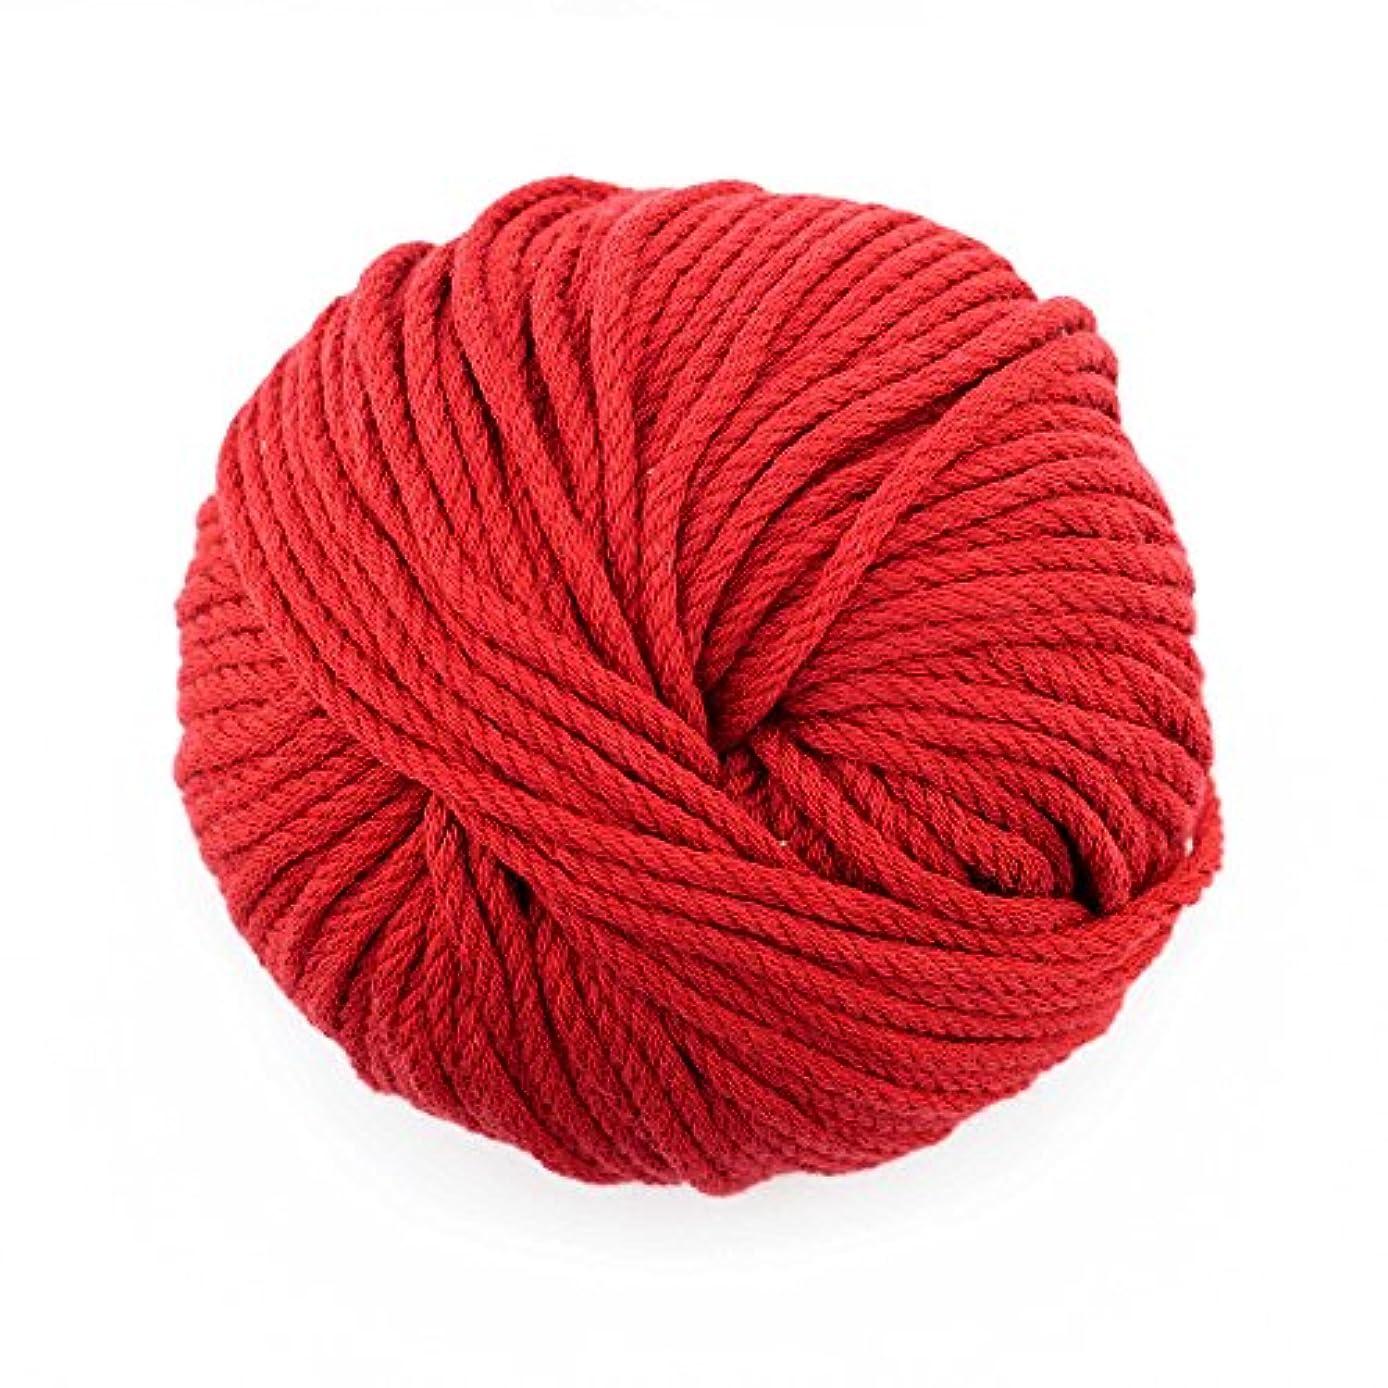 JubileeYarn Bamboo Cotton Chunky Yarn - Red Hot Red - 2 Skeins